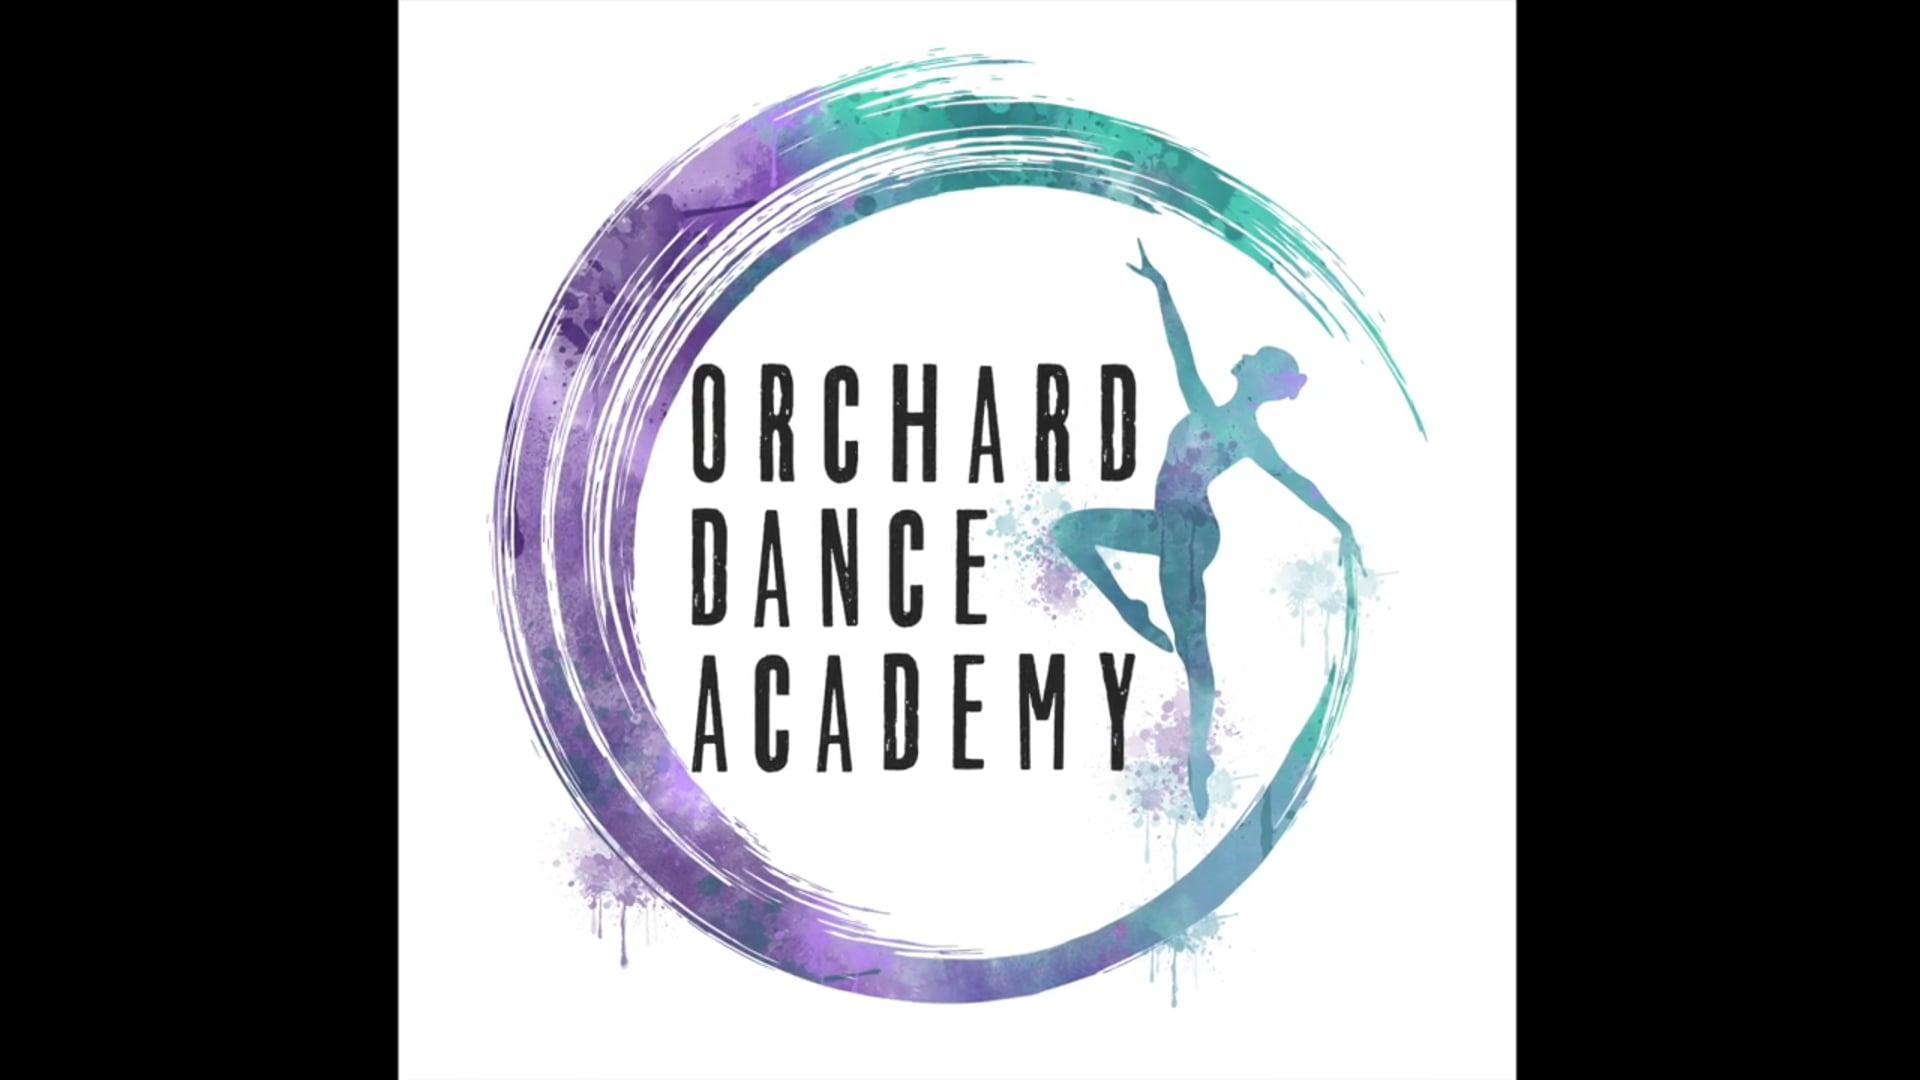 Orchard Dance Academy 2019 Showreel